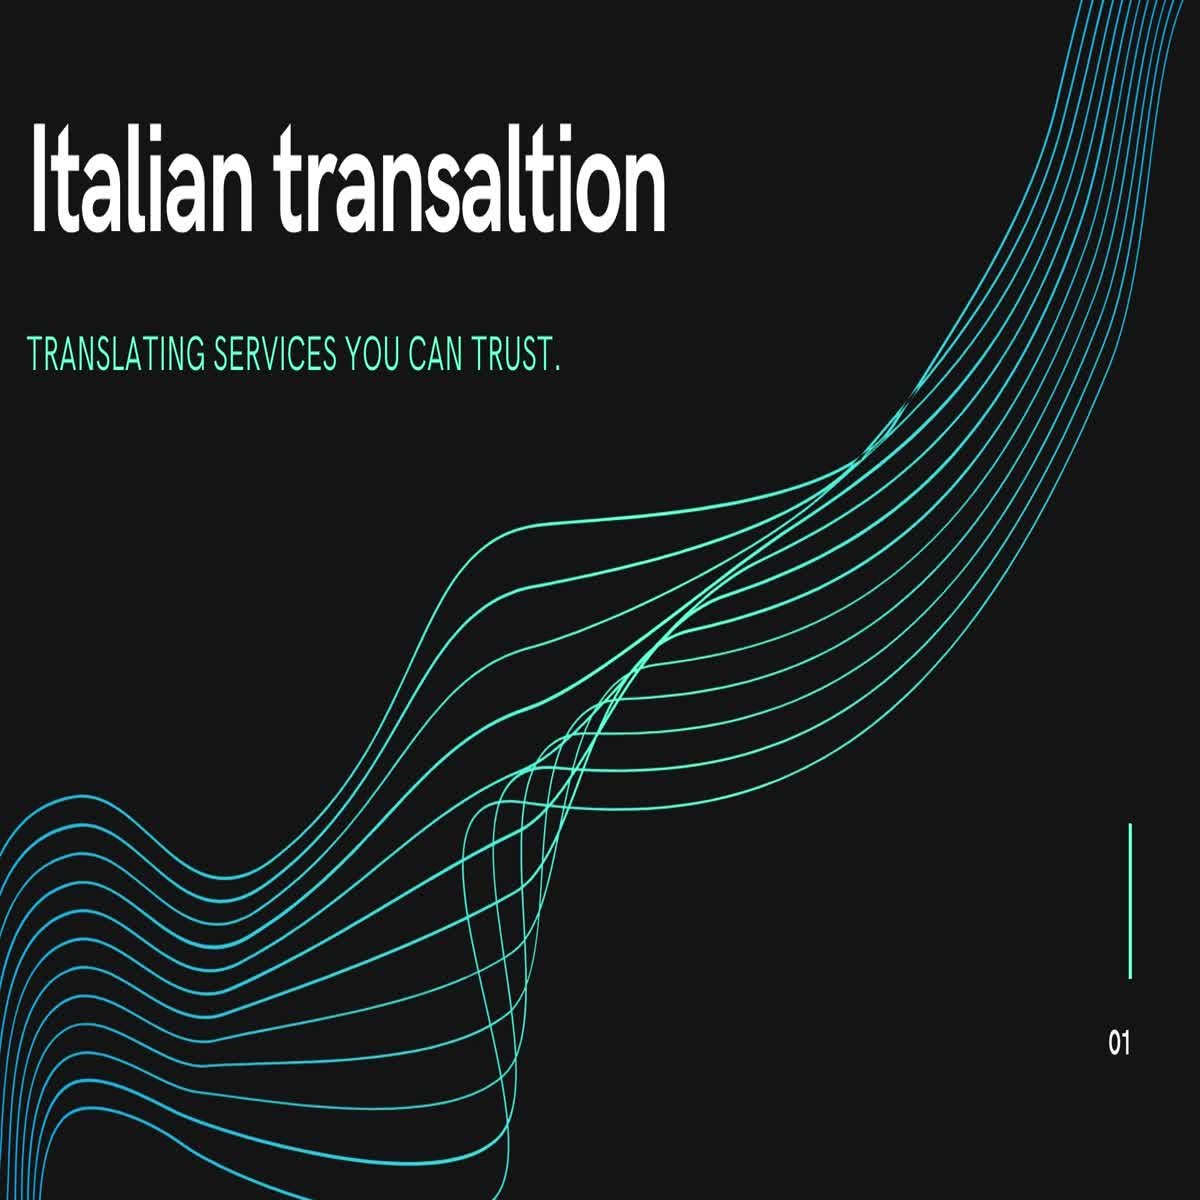 Italian document translation (500 world)